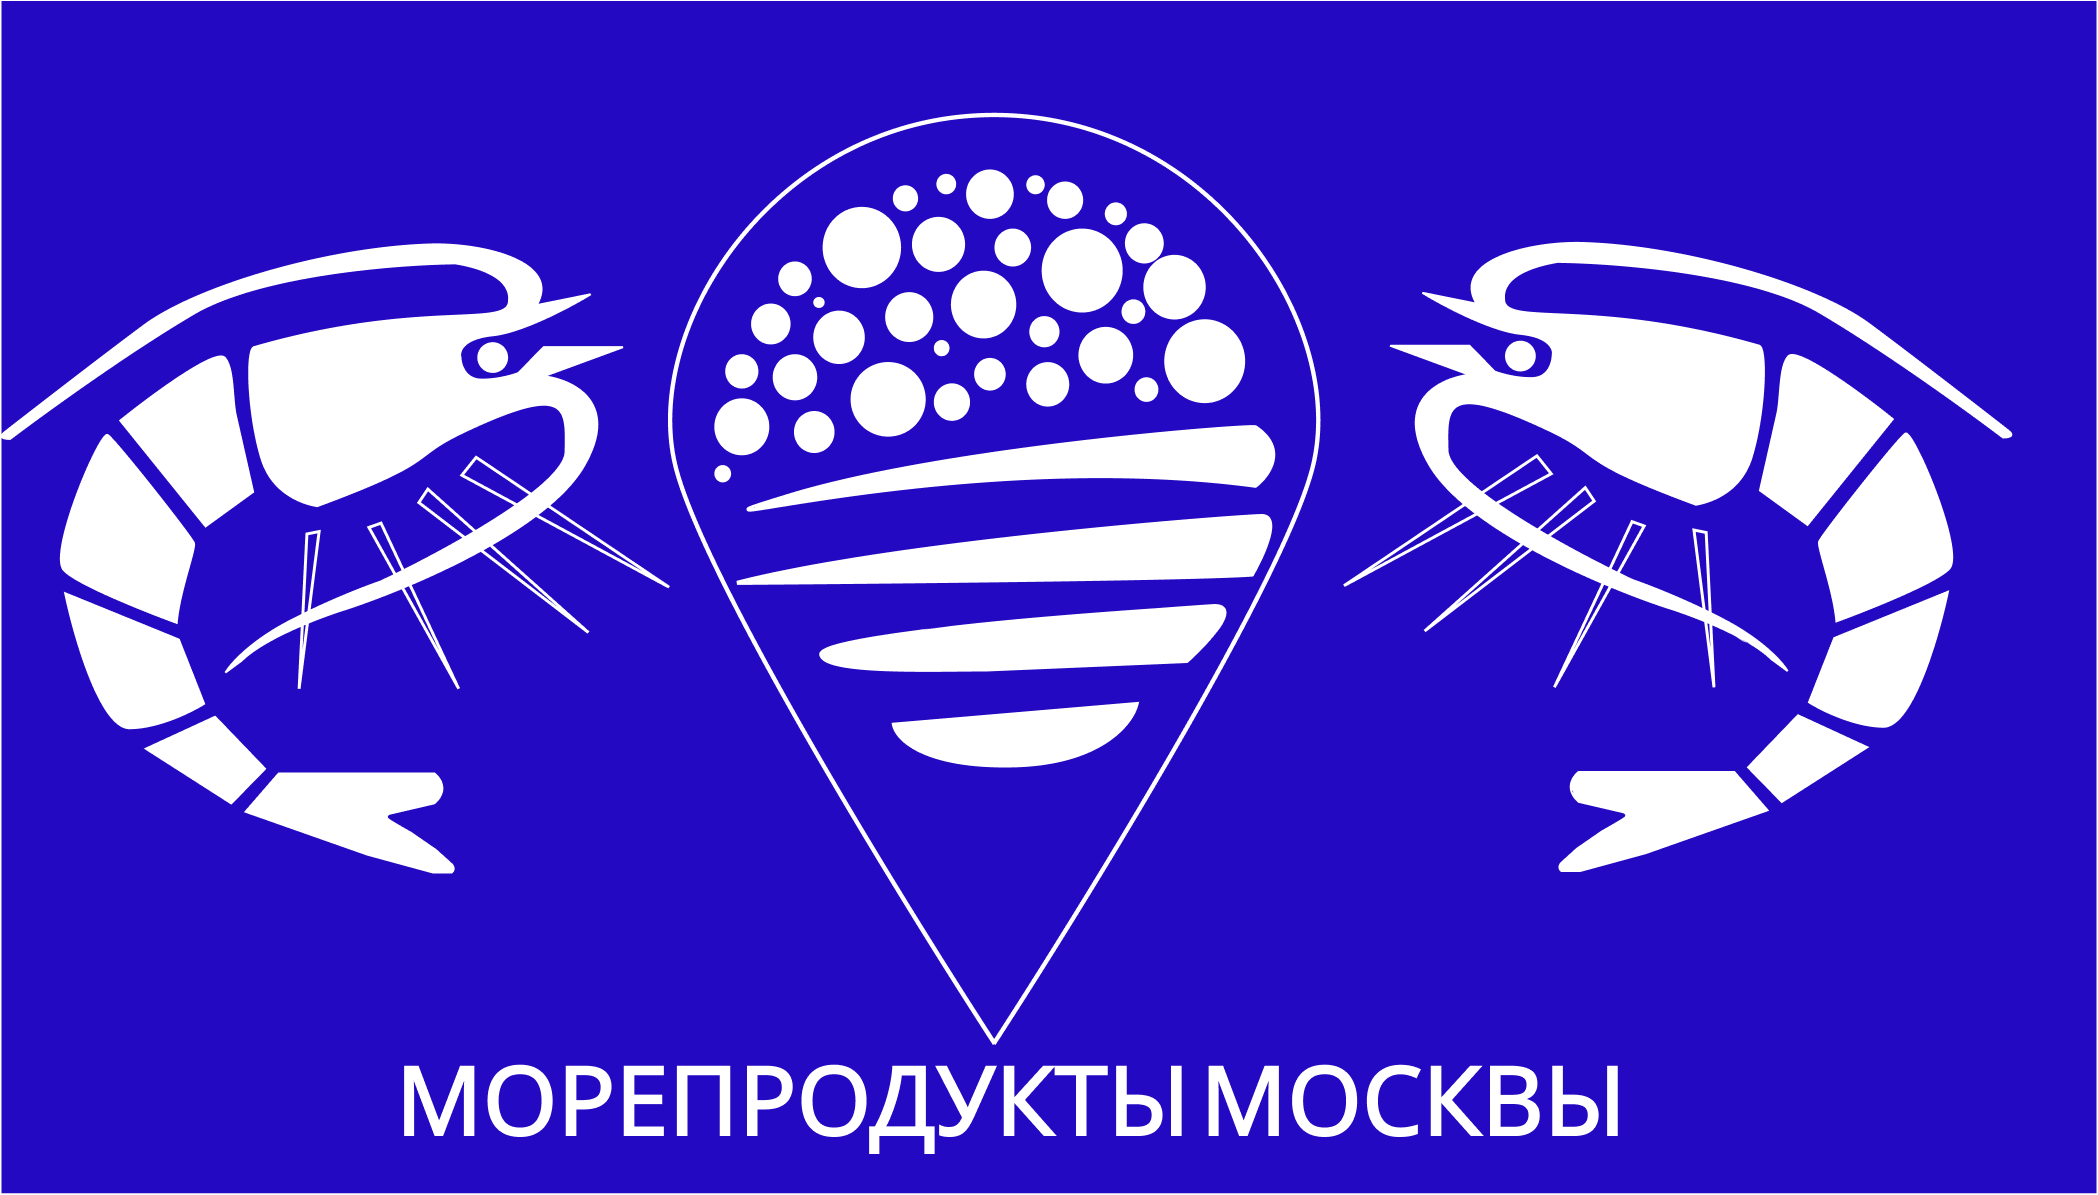 Разработать логотип.  фото f_4775ec79cd75c885.png